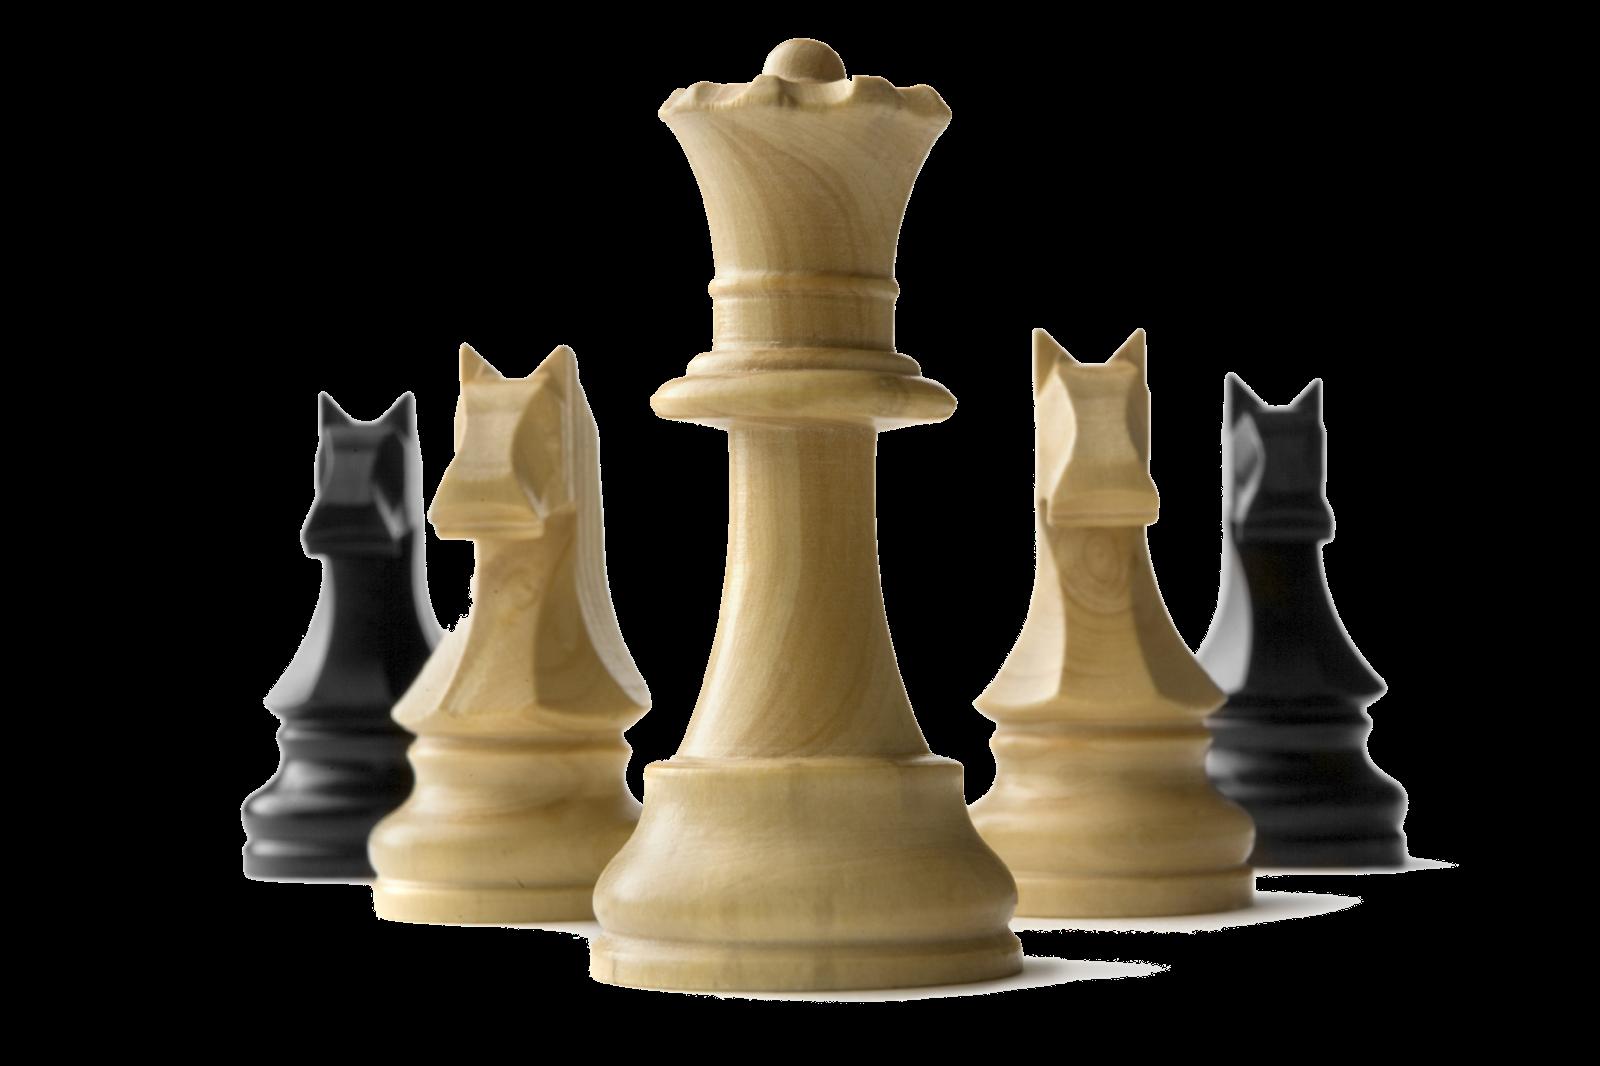 daftar namanama langkah catur terbaik blog pak ikem